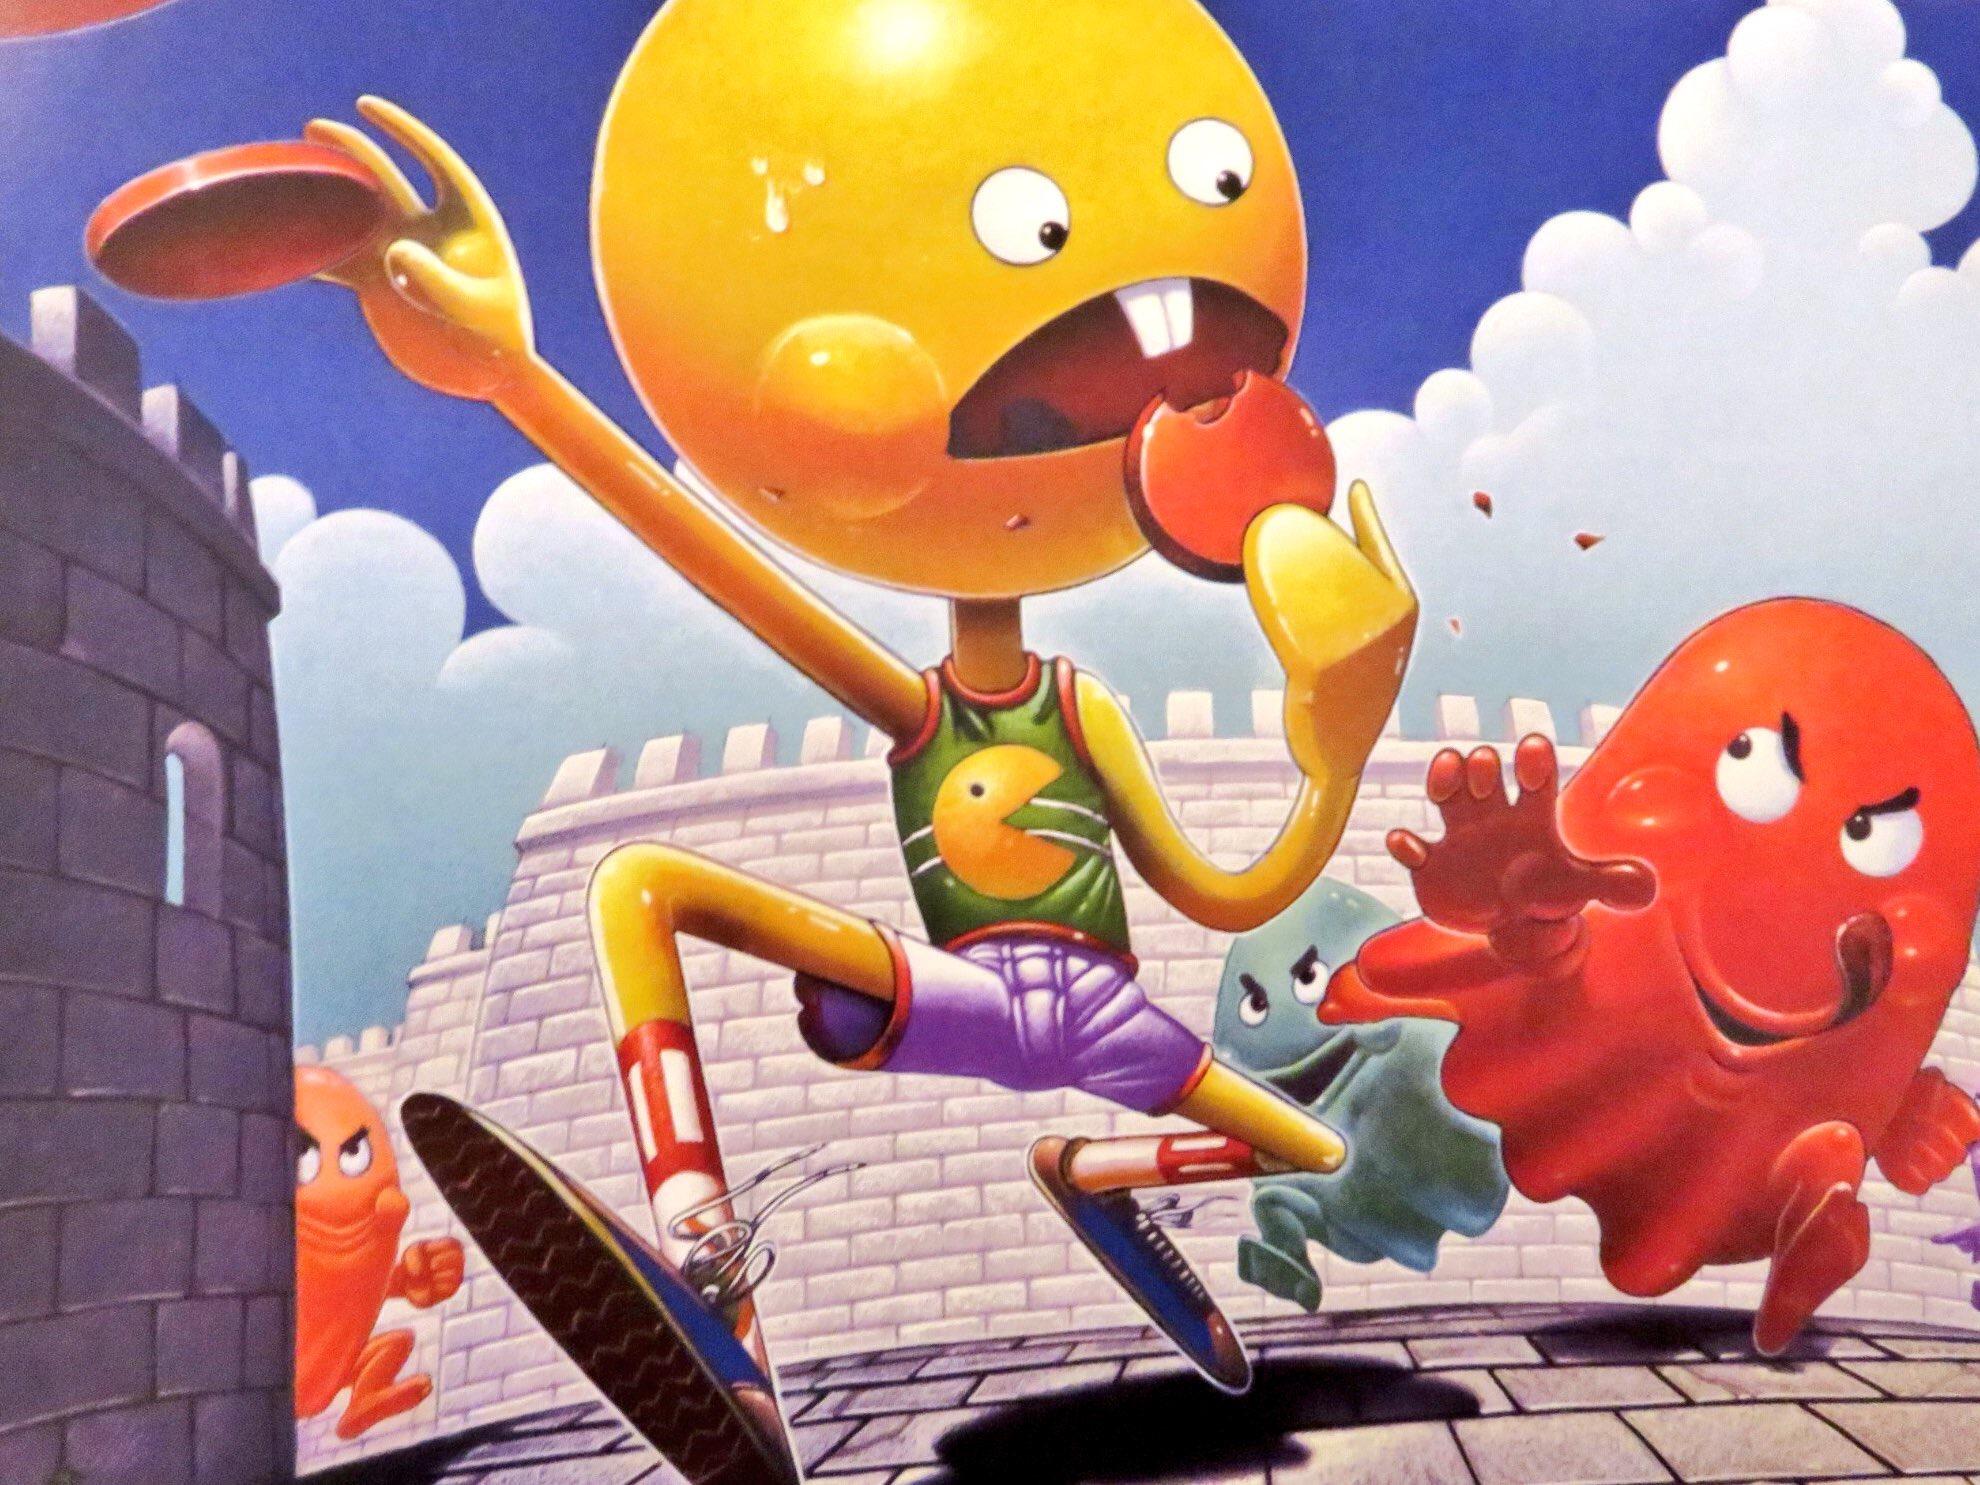 Original box concept for  Pac-Man  by Hiro Kimura. ©  The Art of Atari